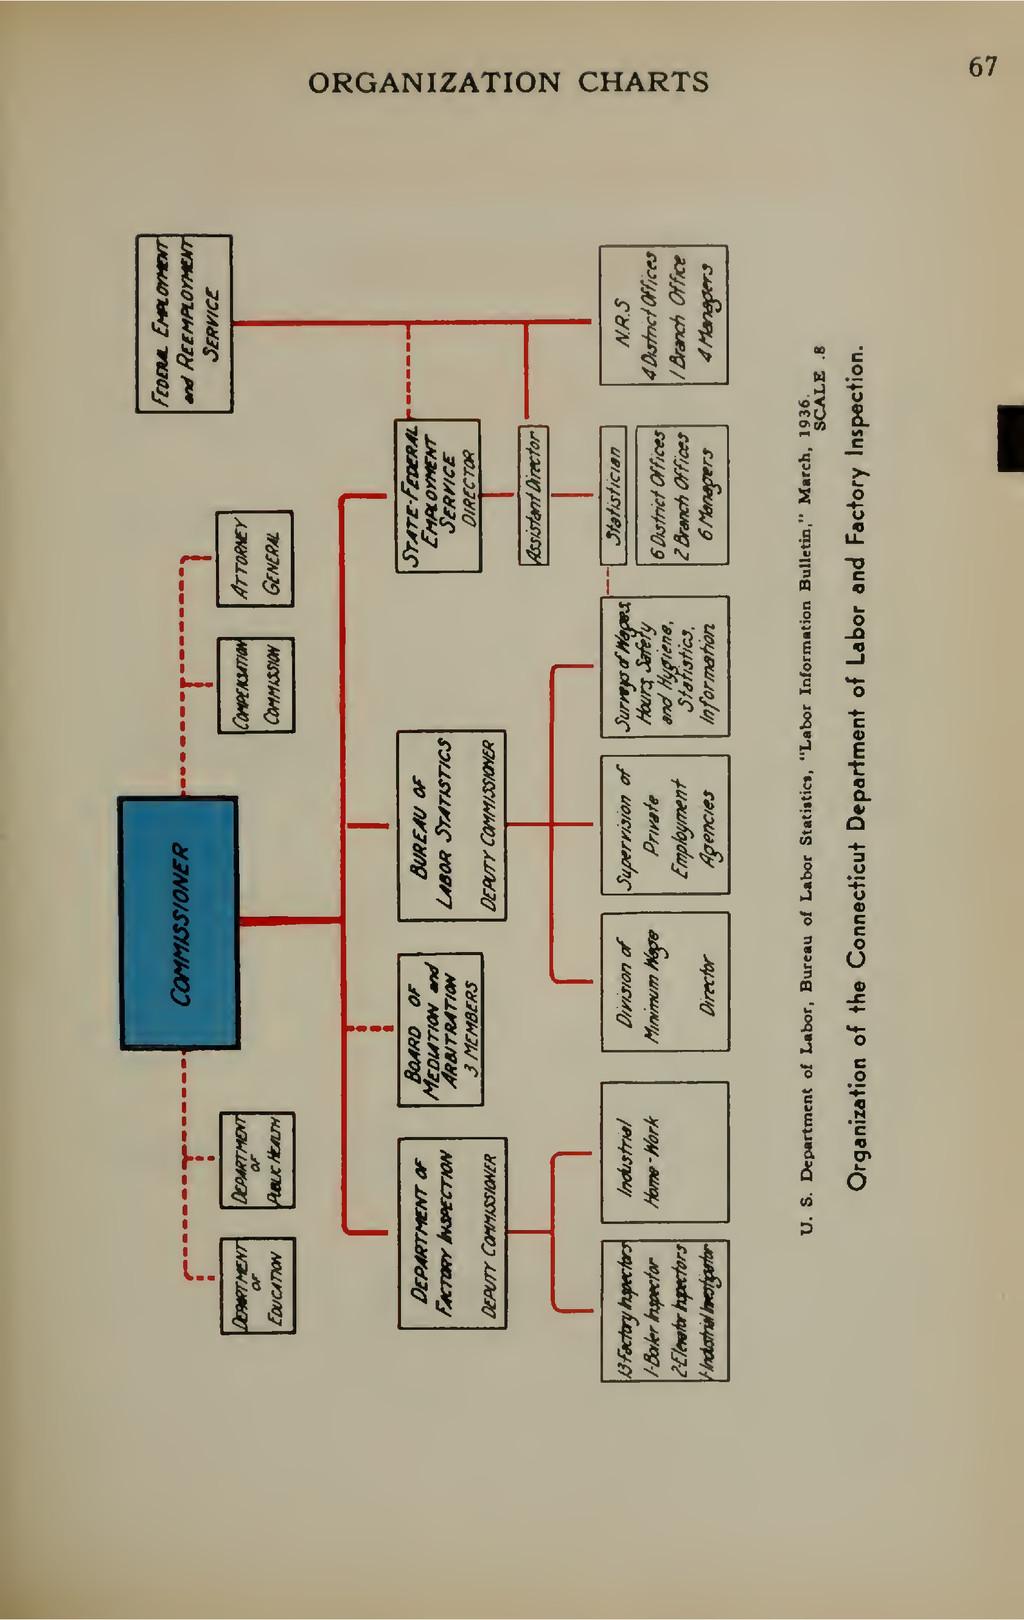 ORGANIZATION CHARTS 67 o o c o I